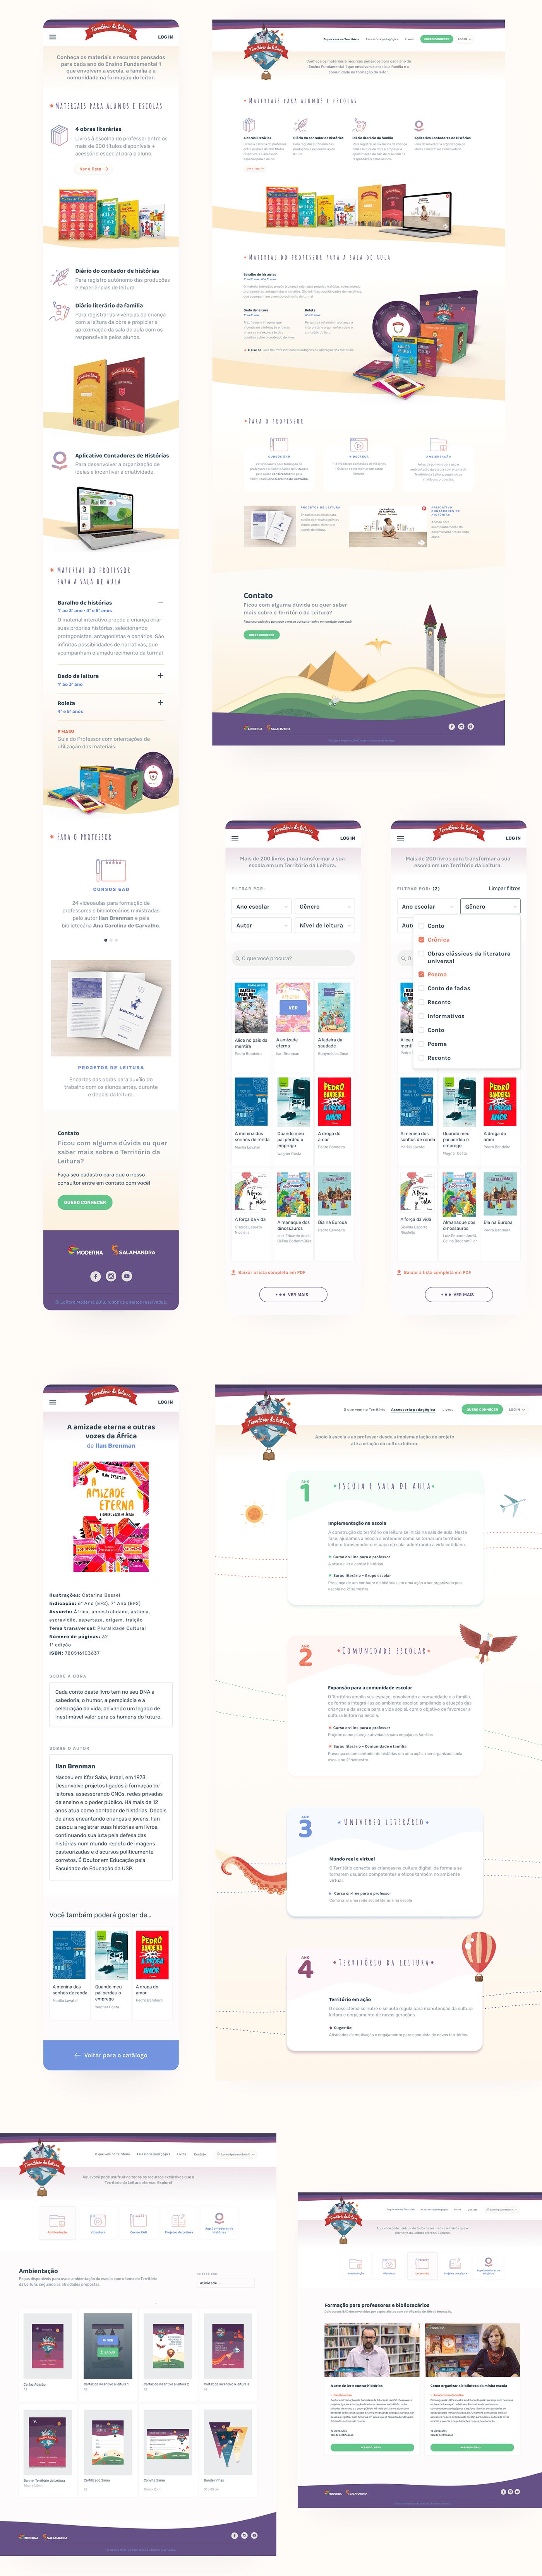 book catalog children books children's litrature educational project primary school Responsive Design